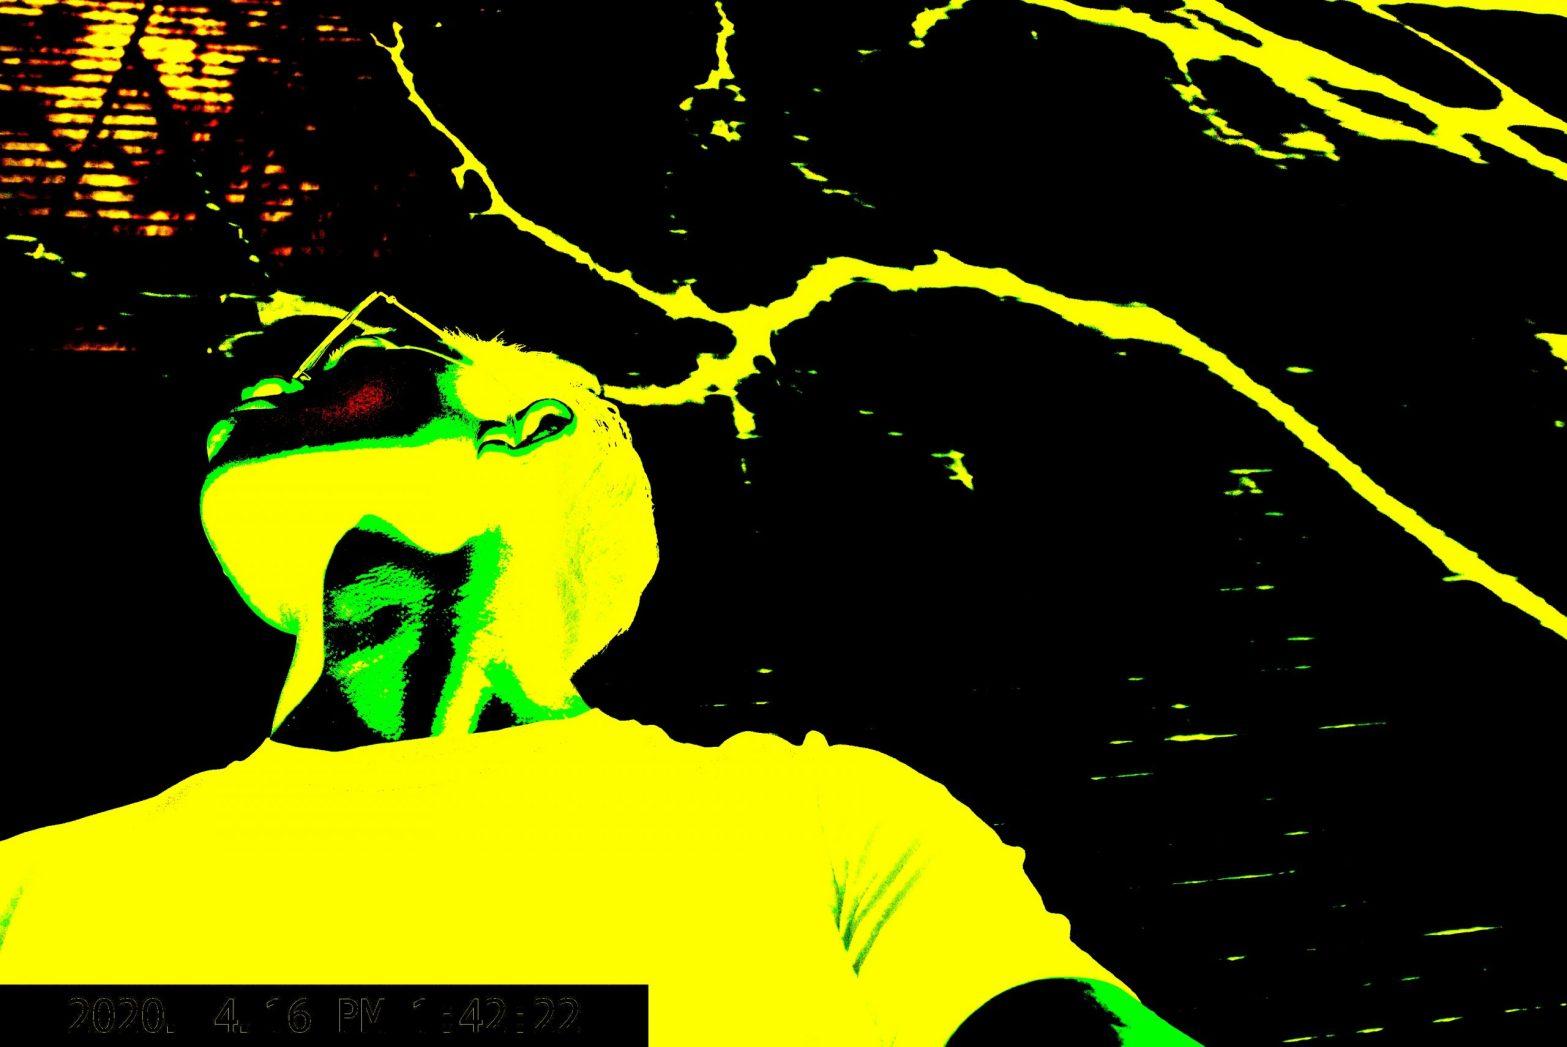 Selfie ERIC yellow